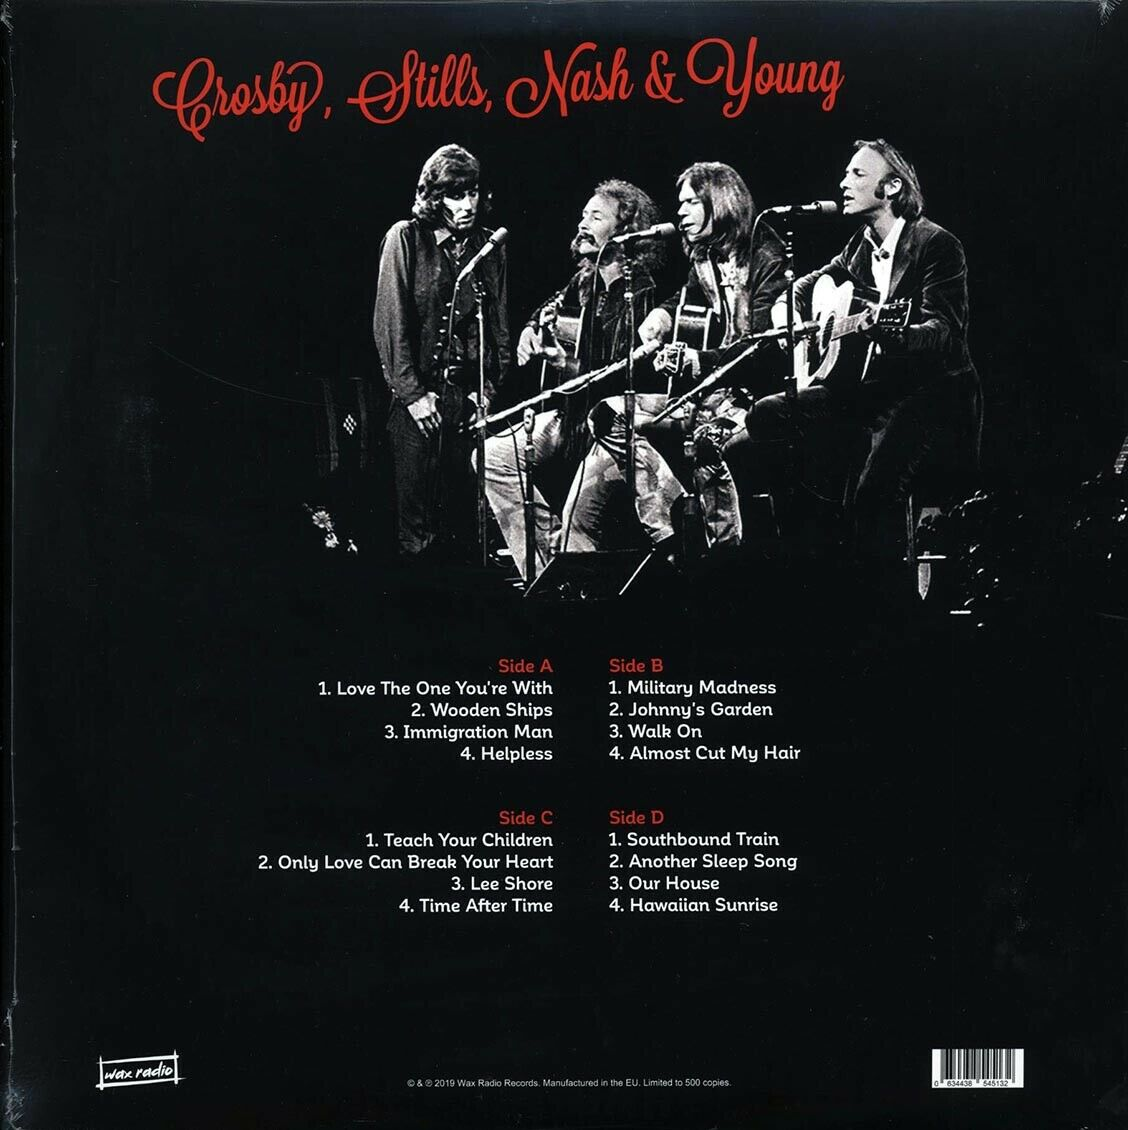 Crosby, Stills, Nash & Young (크로스비, 스틸스, 내쉬 앤 영) - Roosevelt Raceway, Westbury, September 1974: FM Broadcast [2LP]